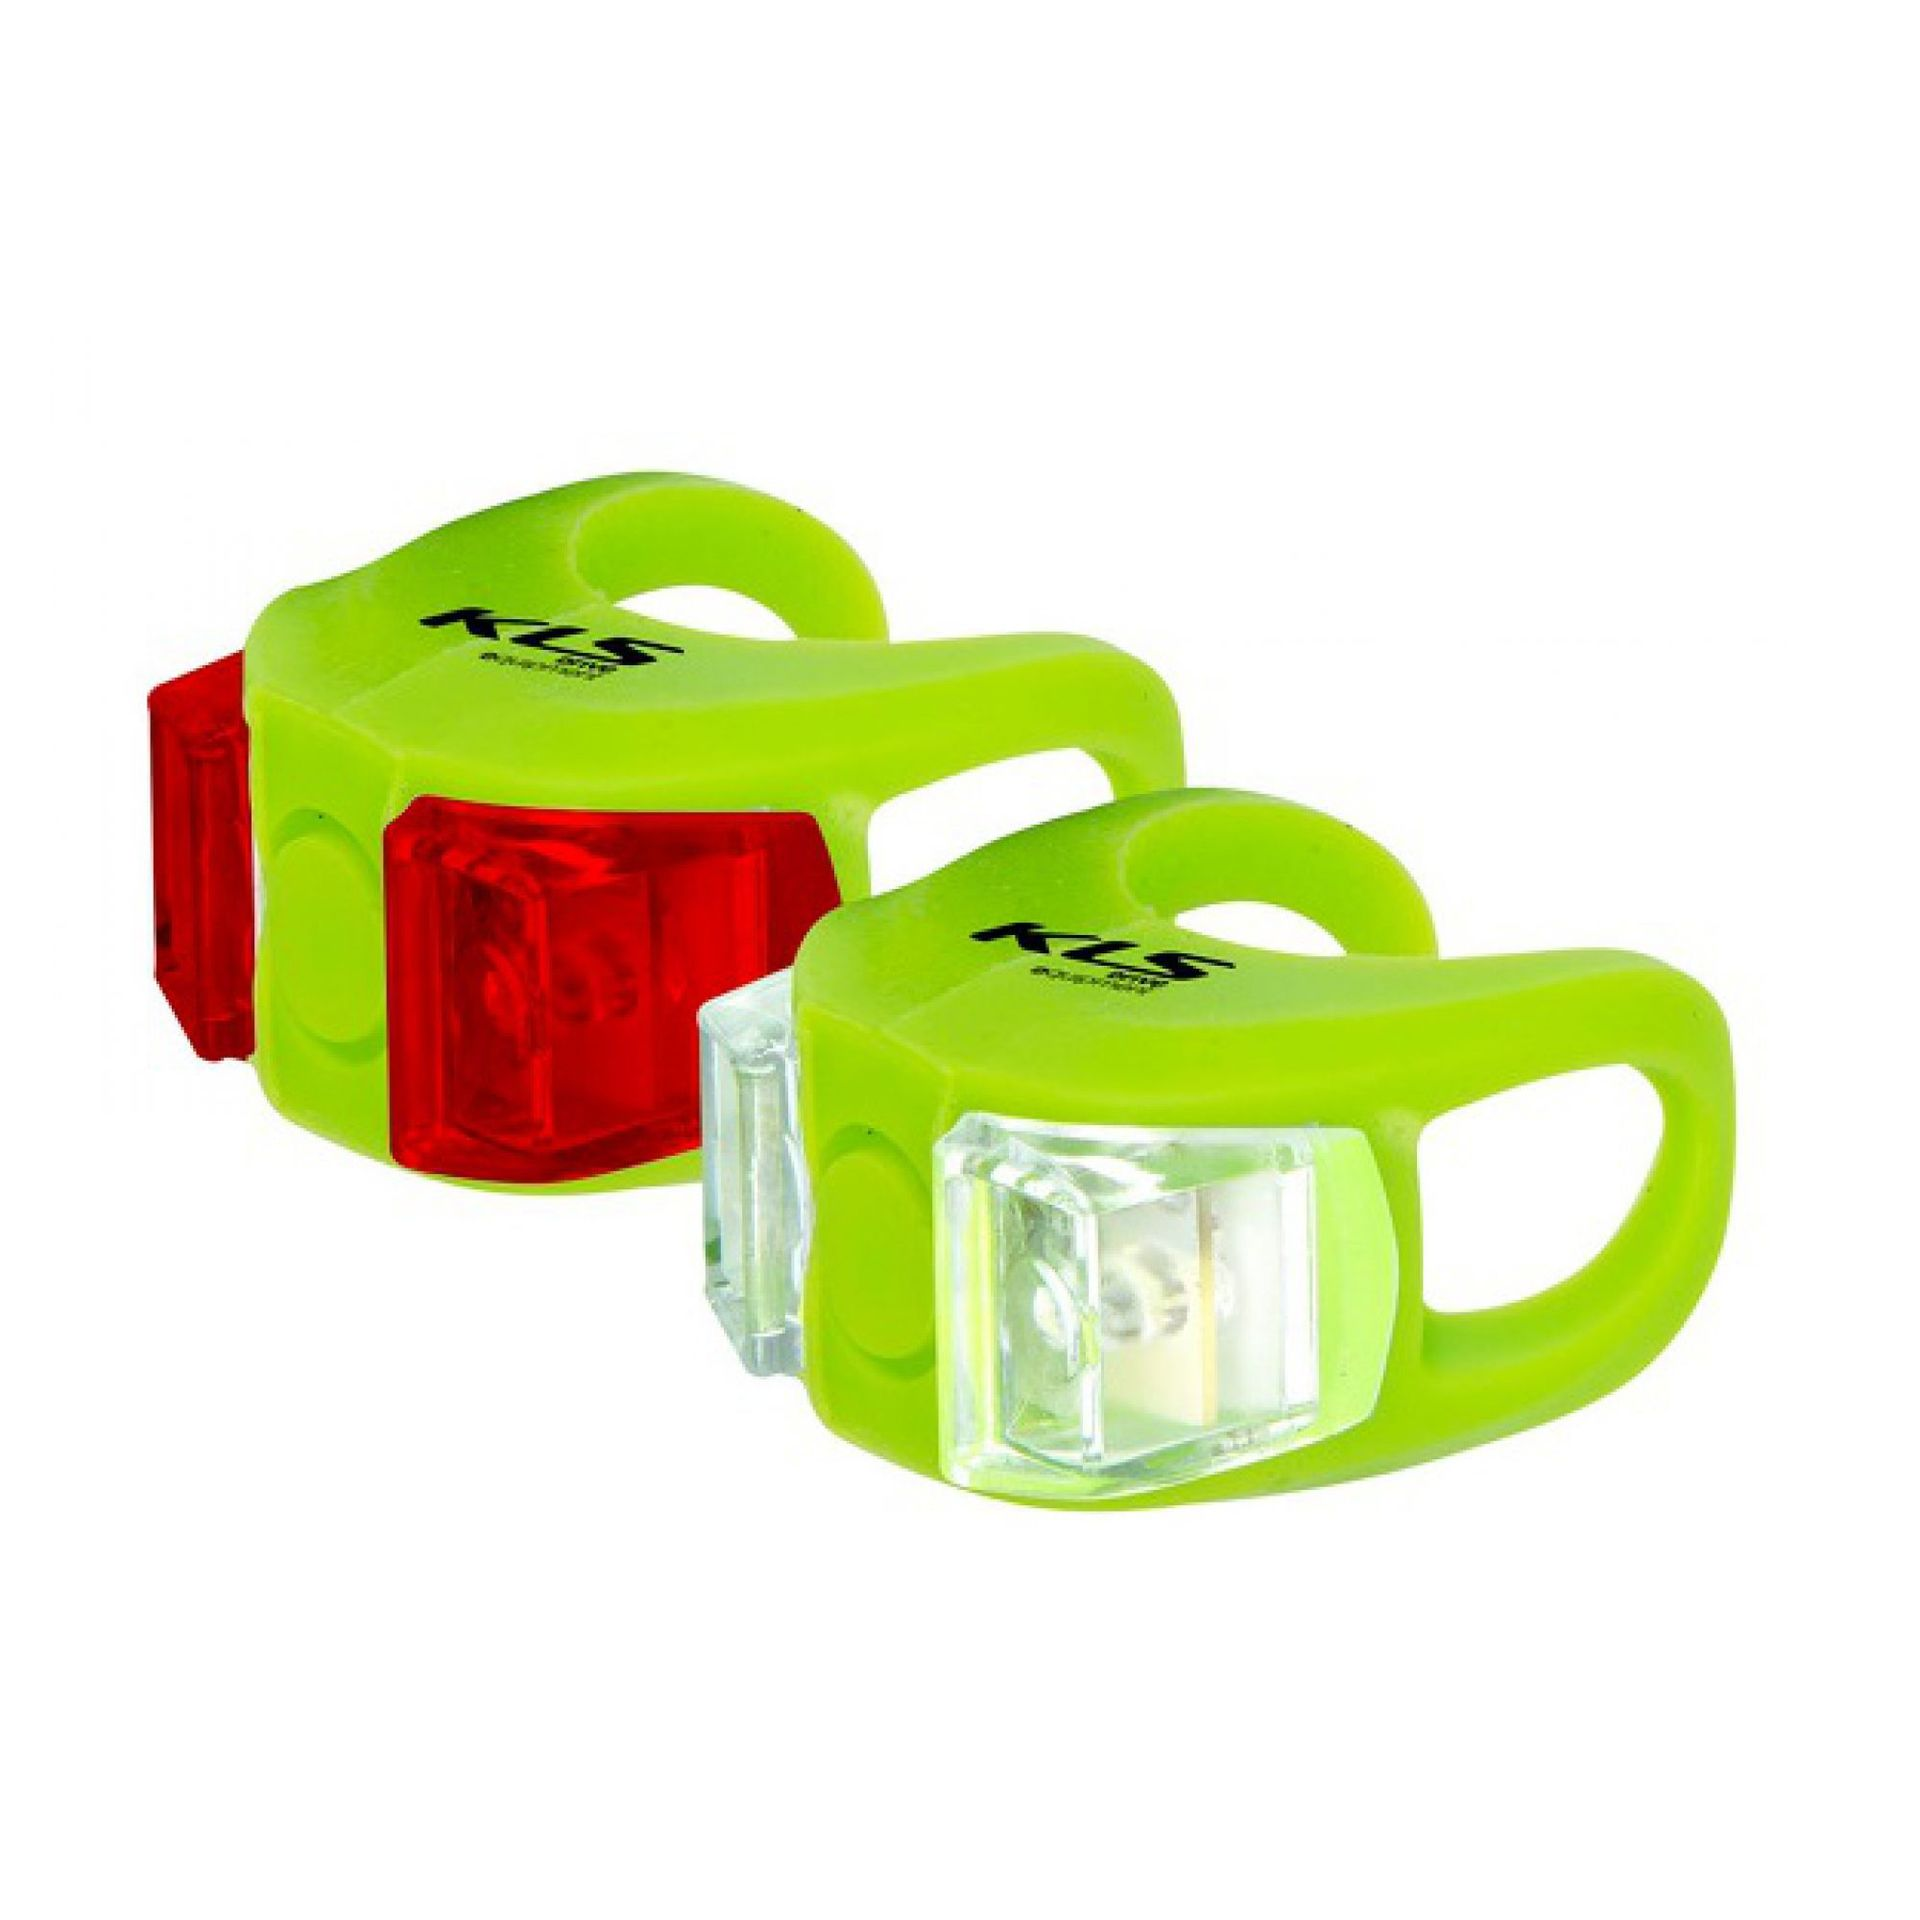 ZESTAW LAMPEK ROWEROWYCH KELLYS TWINS lime